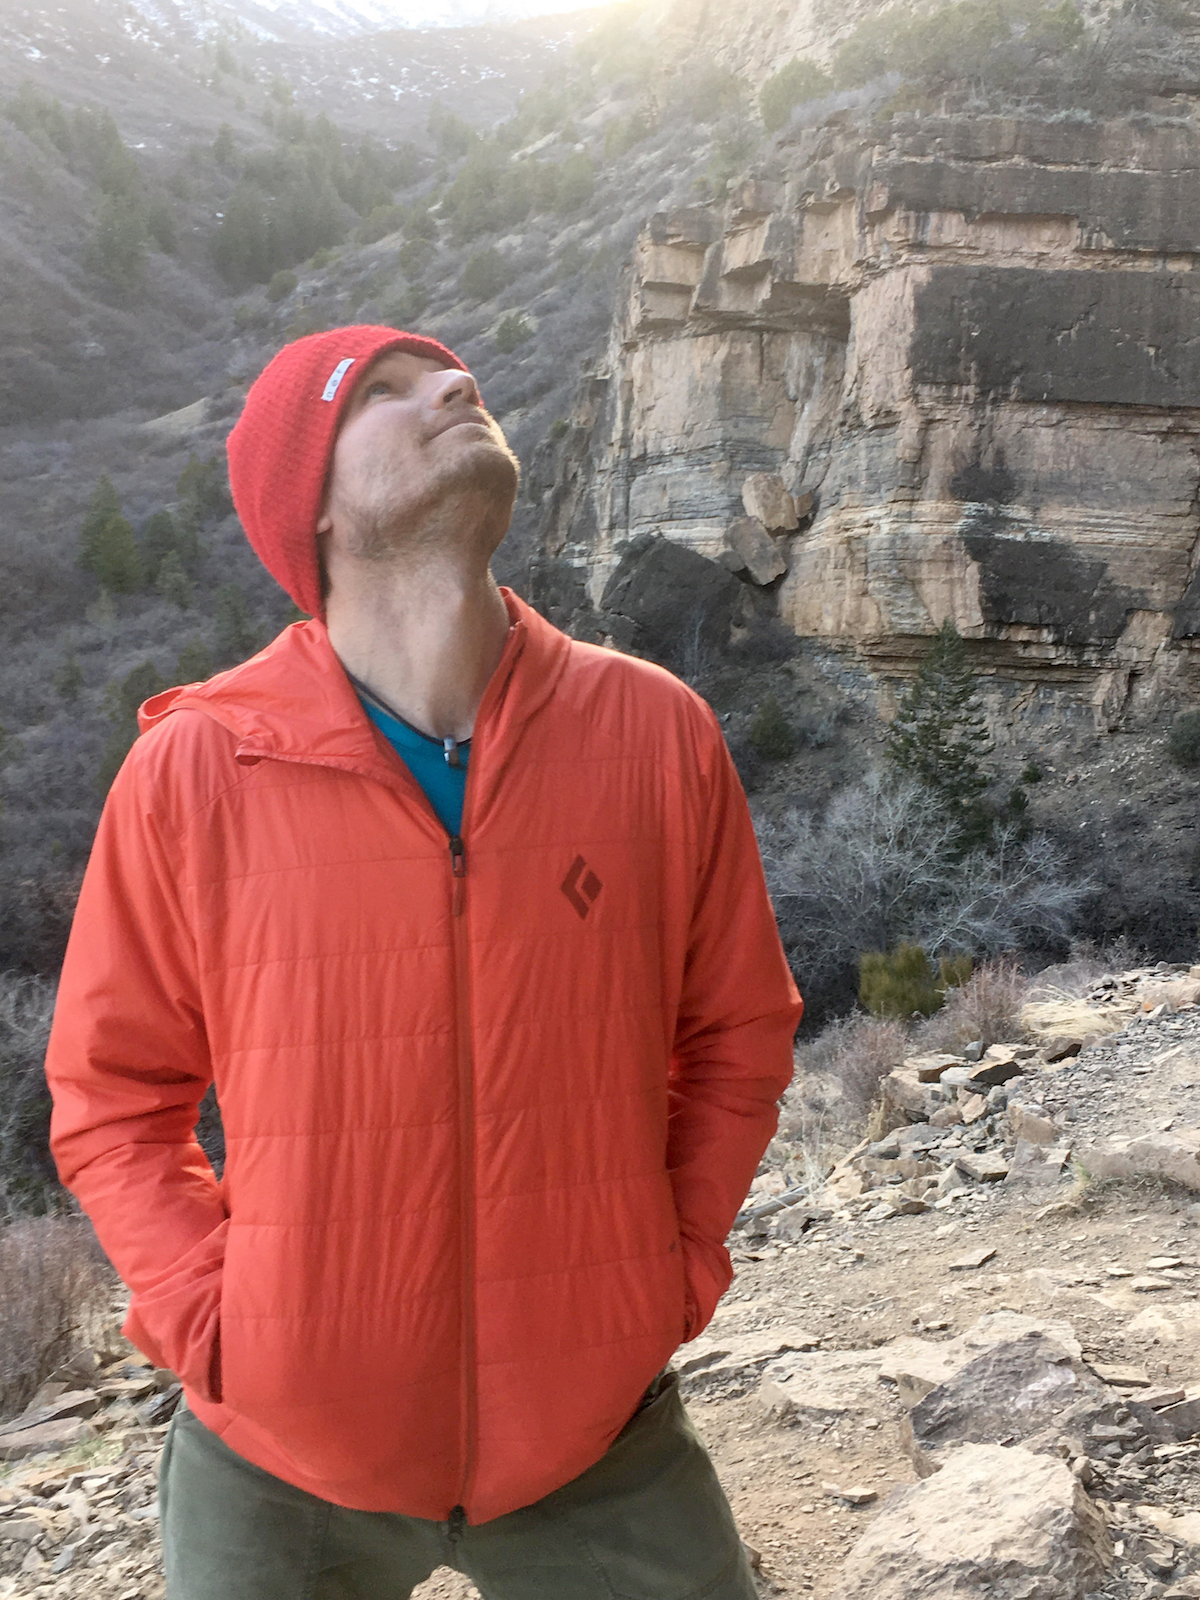 The Black Diamond Access Hoody keeps Derek Franz comfortable between climbs at Main Elk, Colorado, in early March. [Photo] Mandi Franz